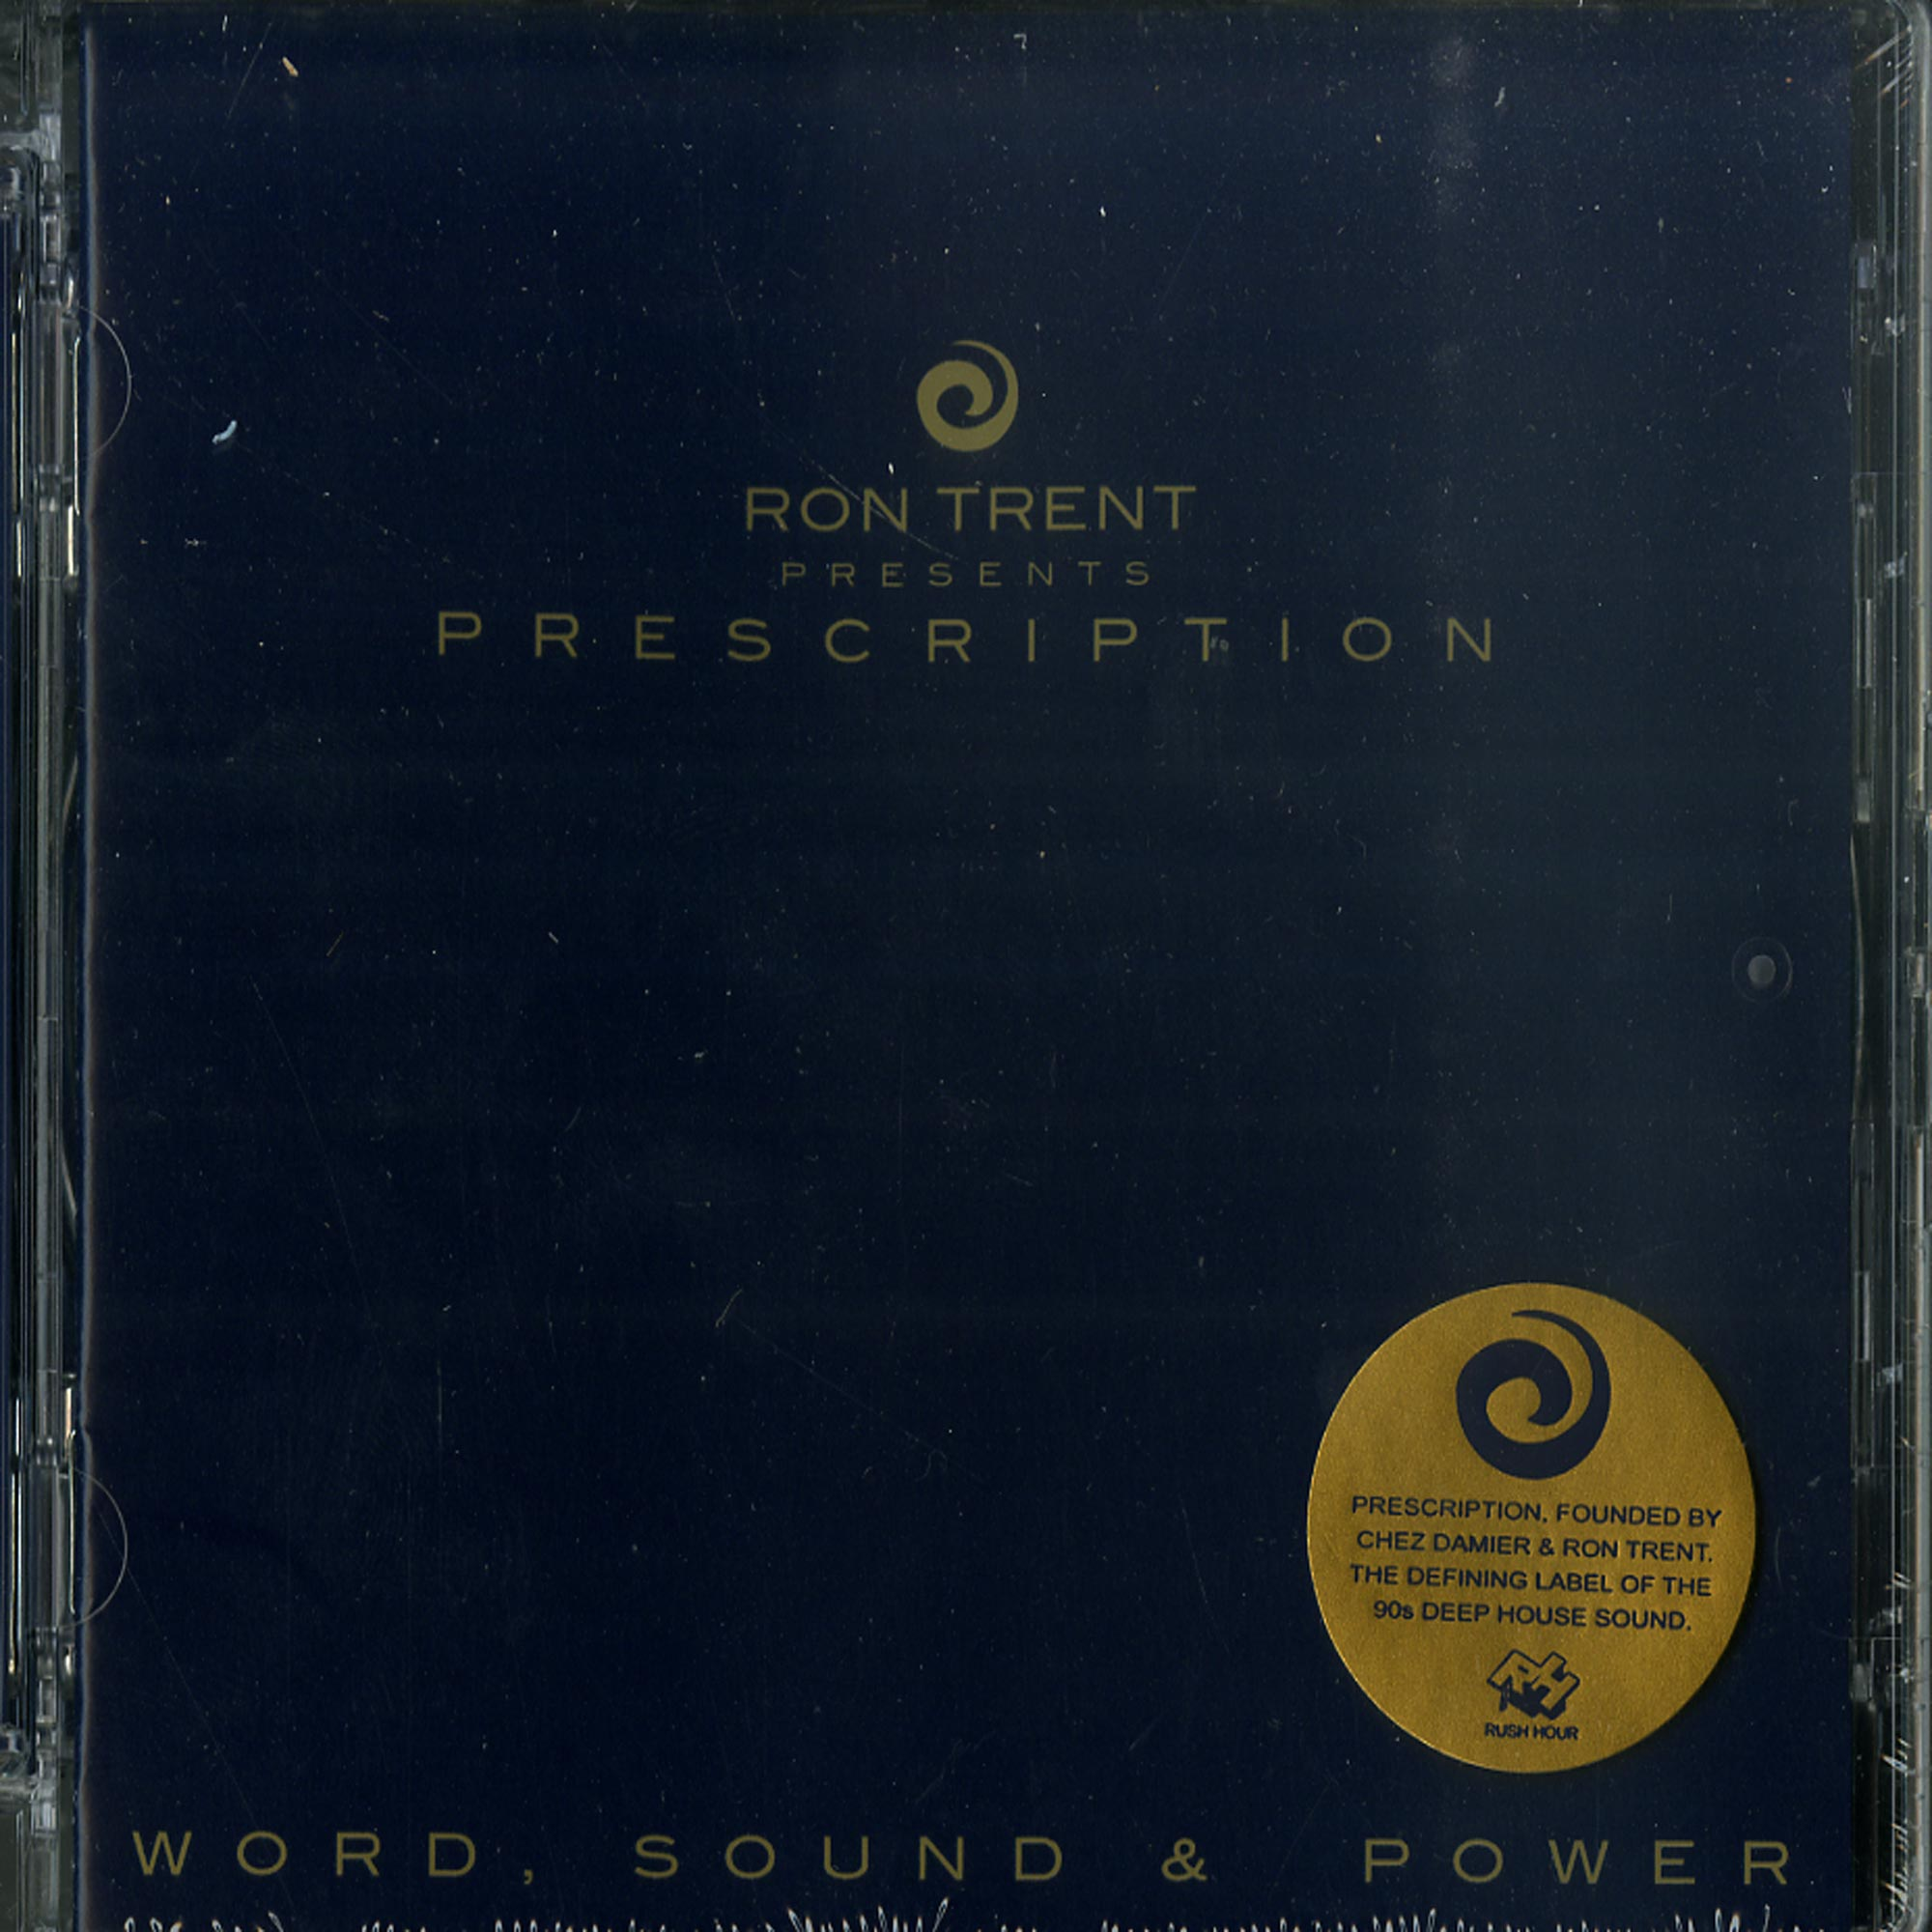 Ron Trent Presents - PRESCRIPTION : WORD, SOUND & POWER